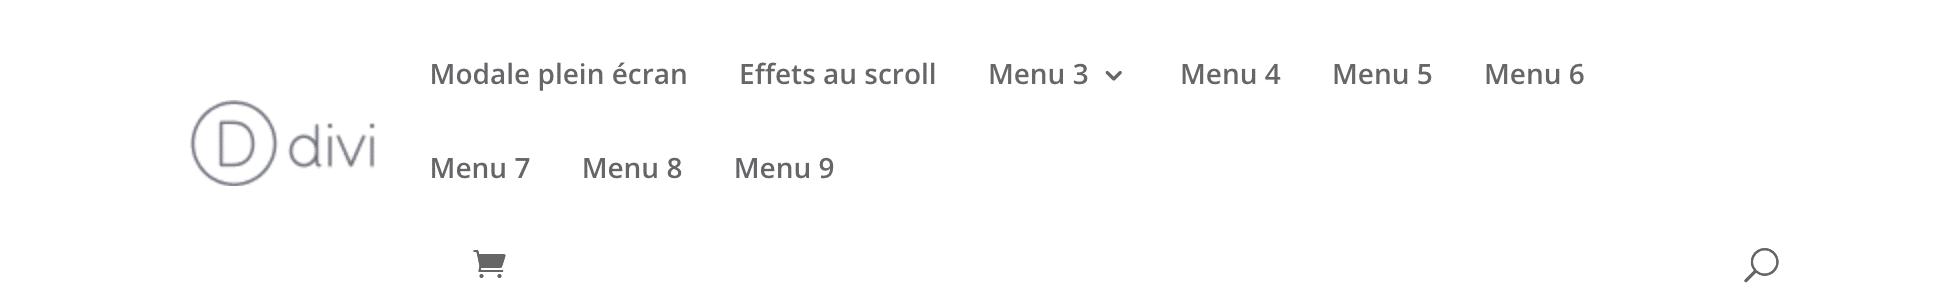 menu divi community